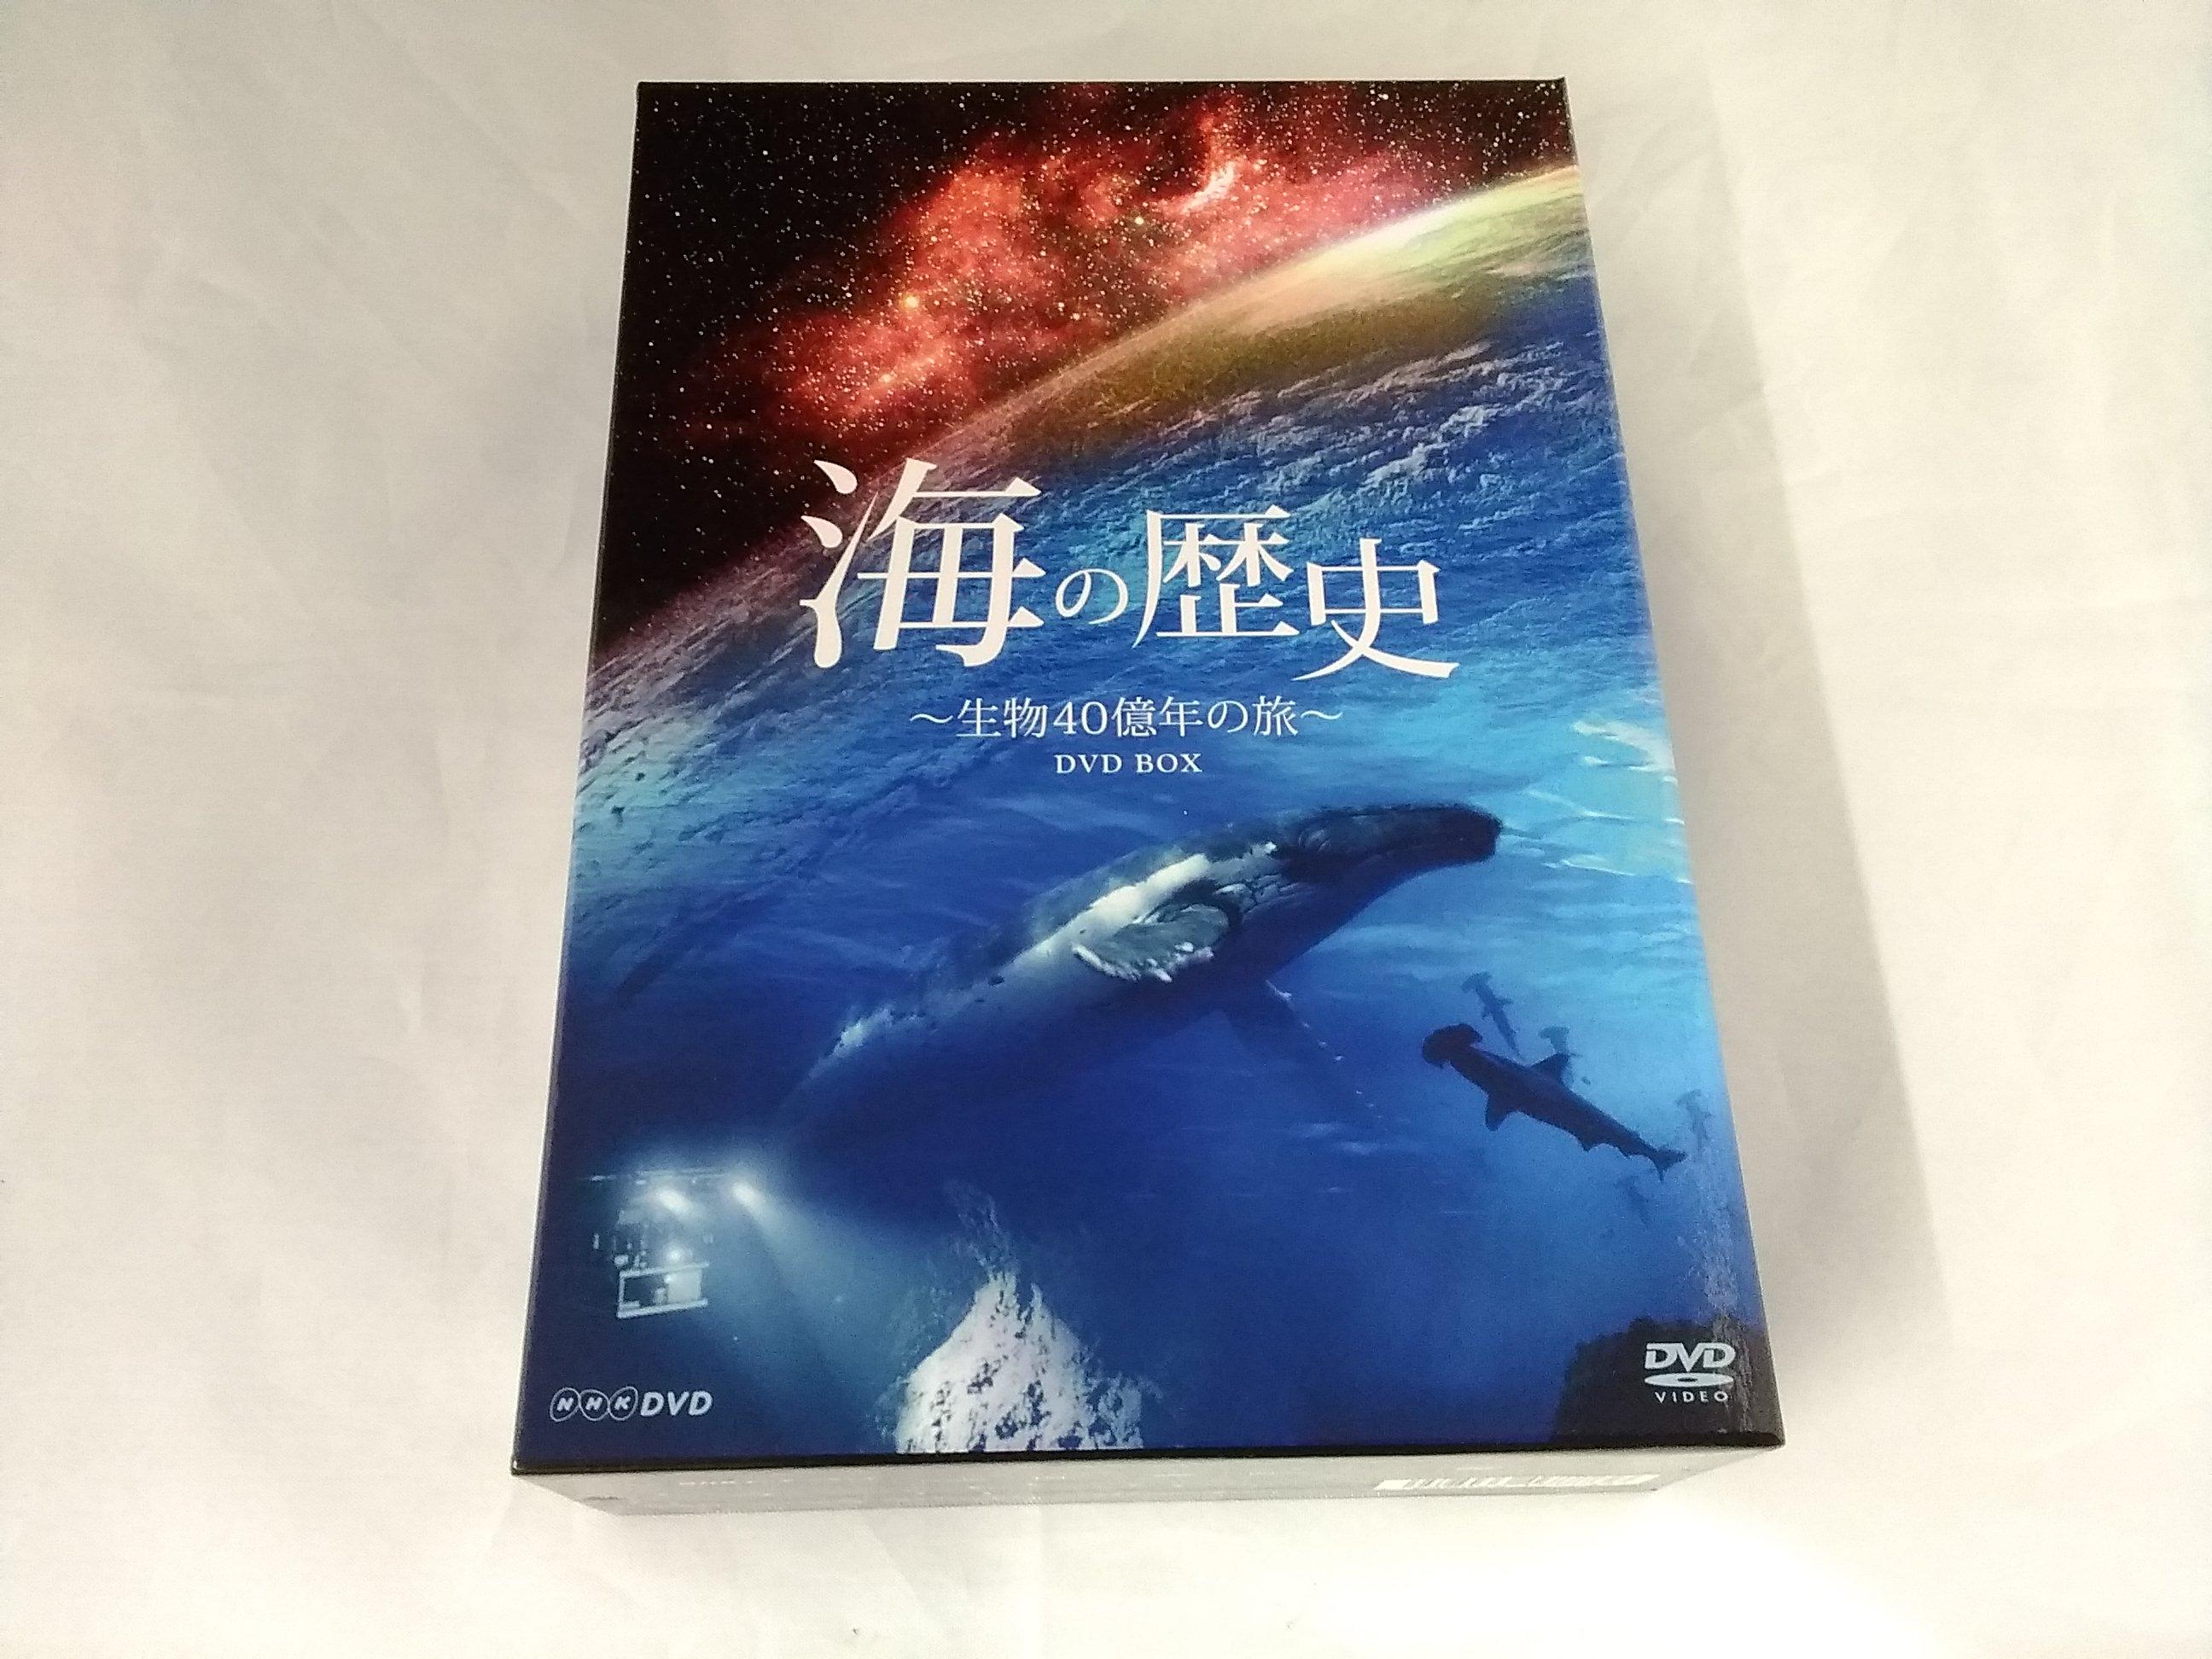 DVD-BOX|NHKエンタープライズ